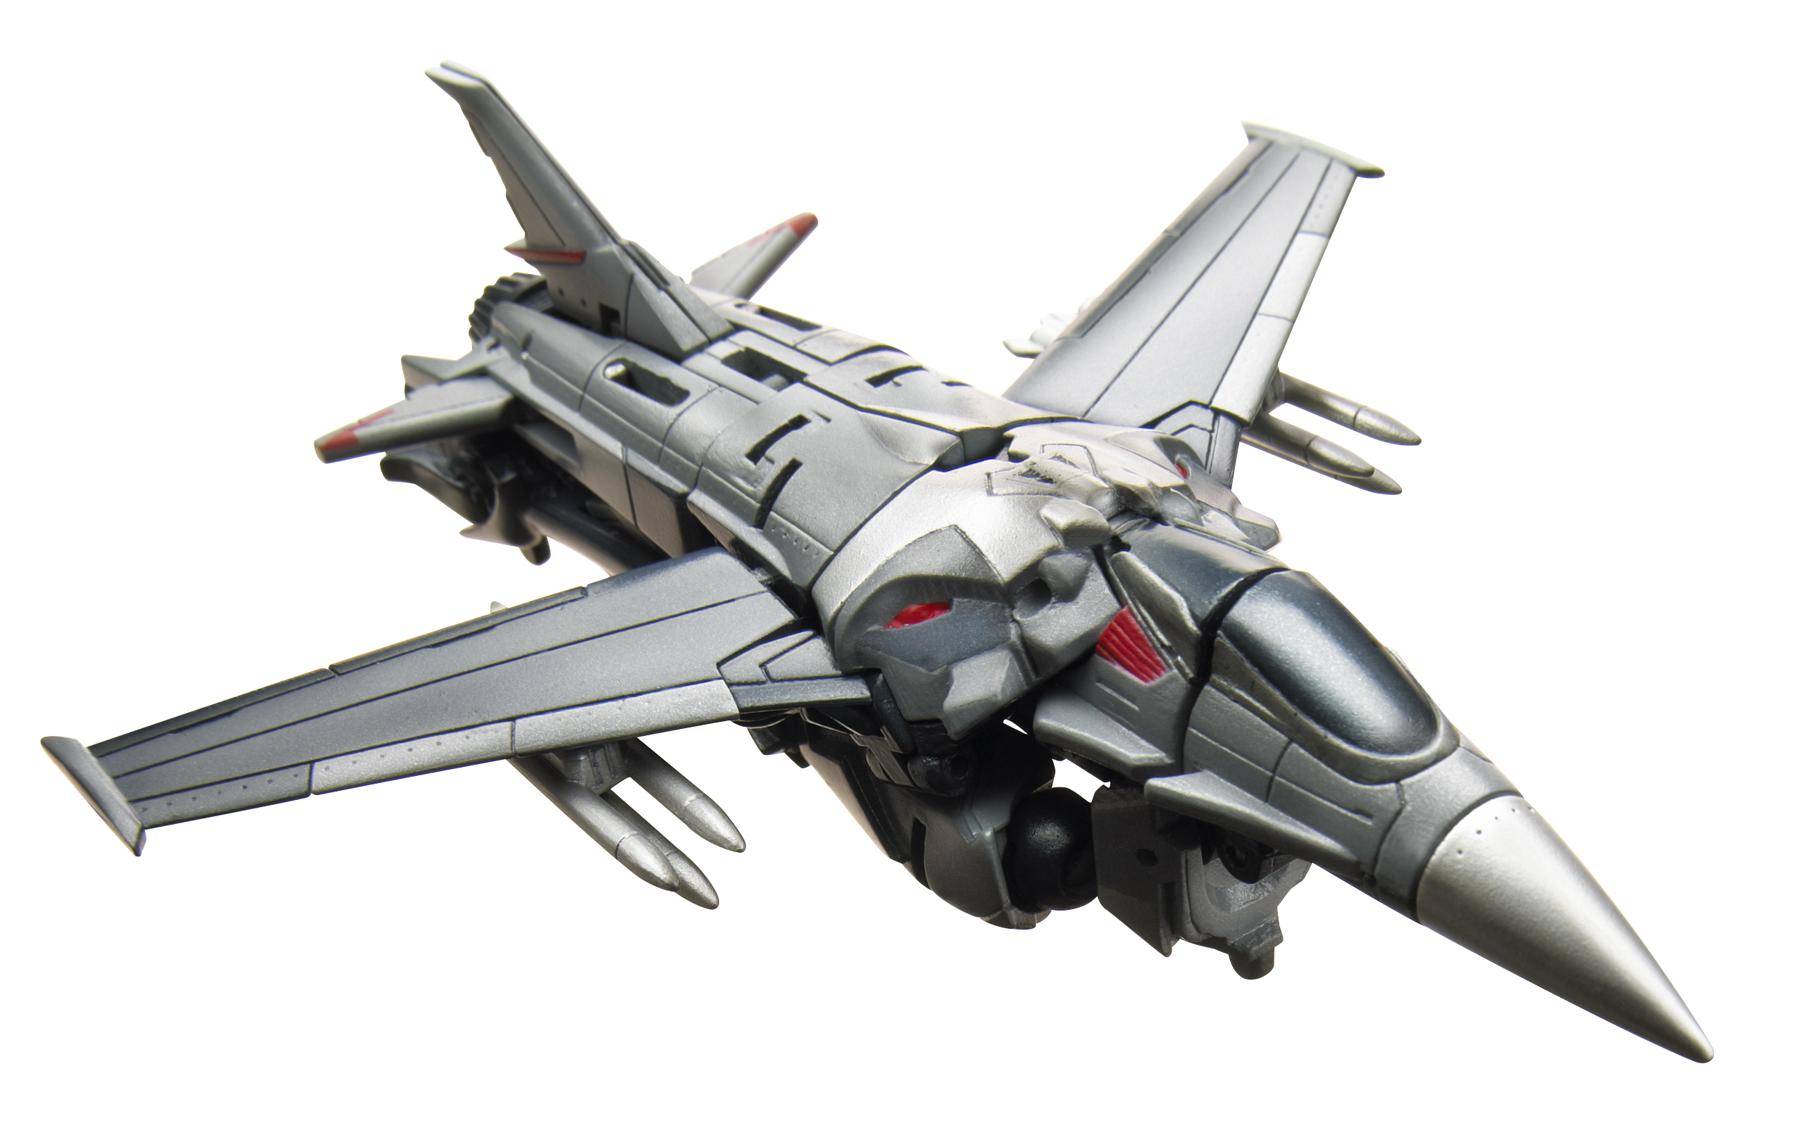 Transformers  Prime Deluxe Starscream Toy Revealed